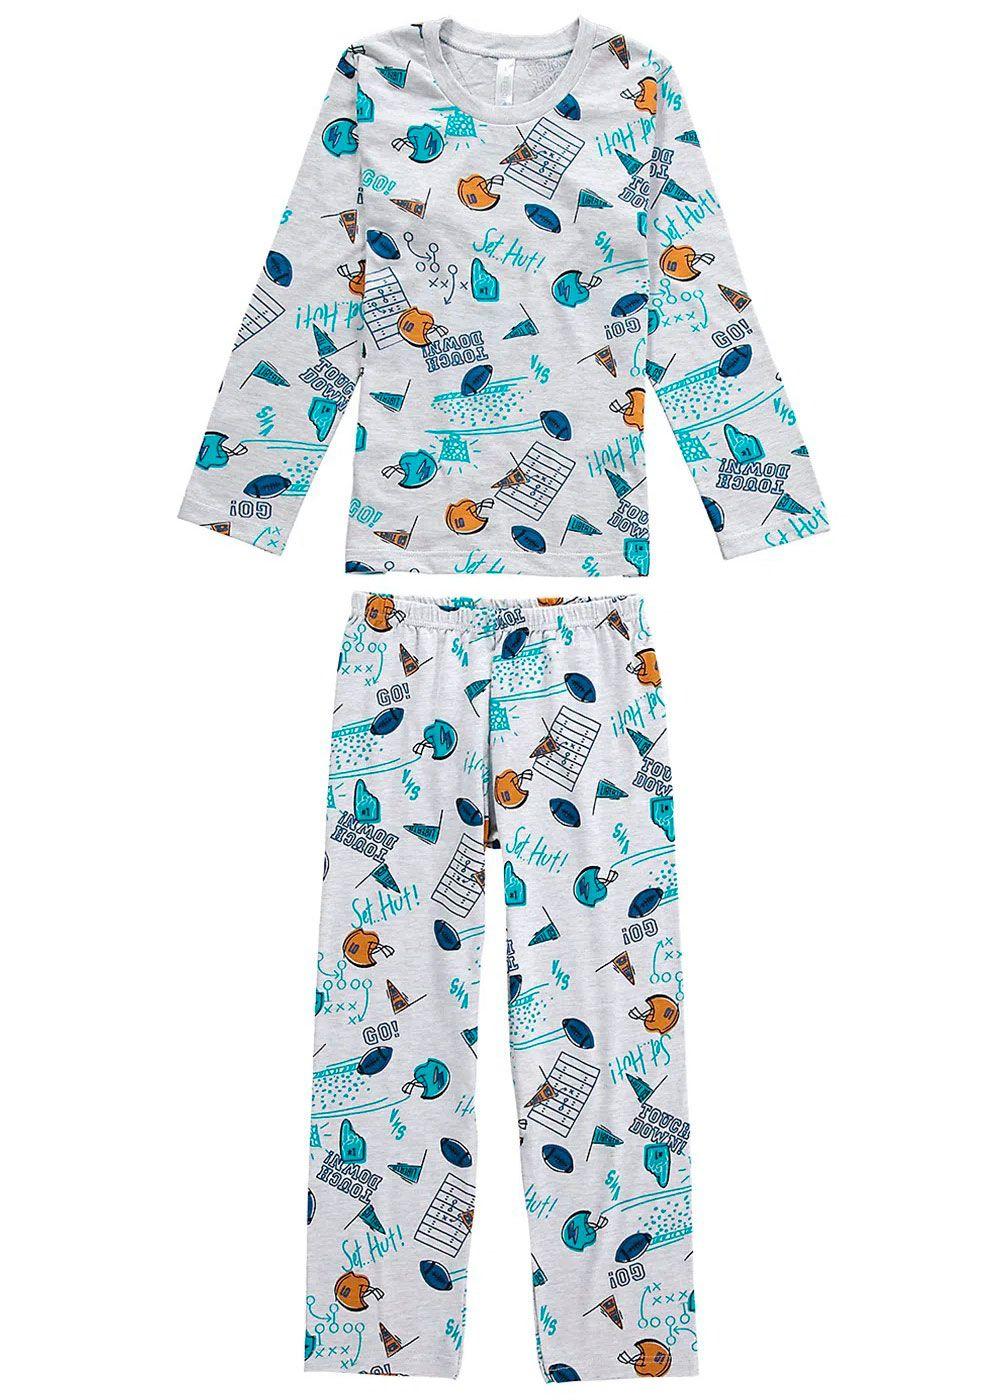 Pijama Infantil Masculino Inverno Cinza GO Malwee